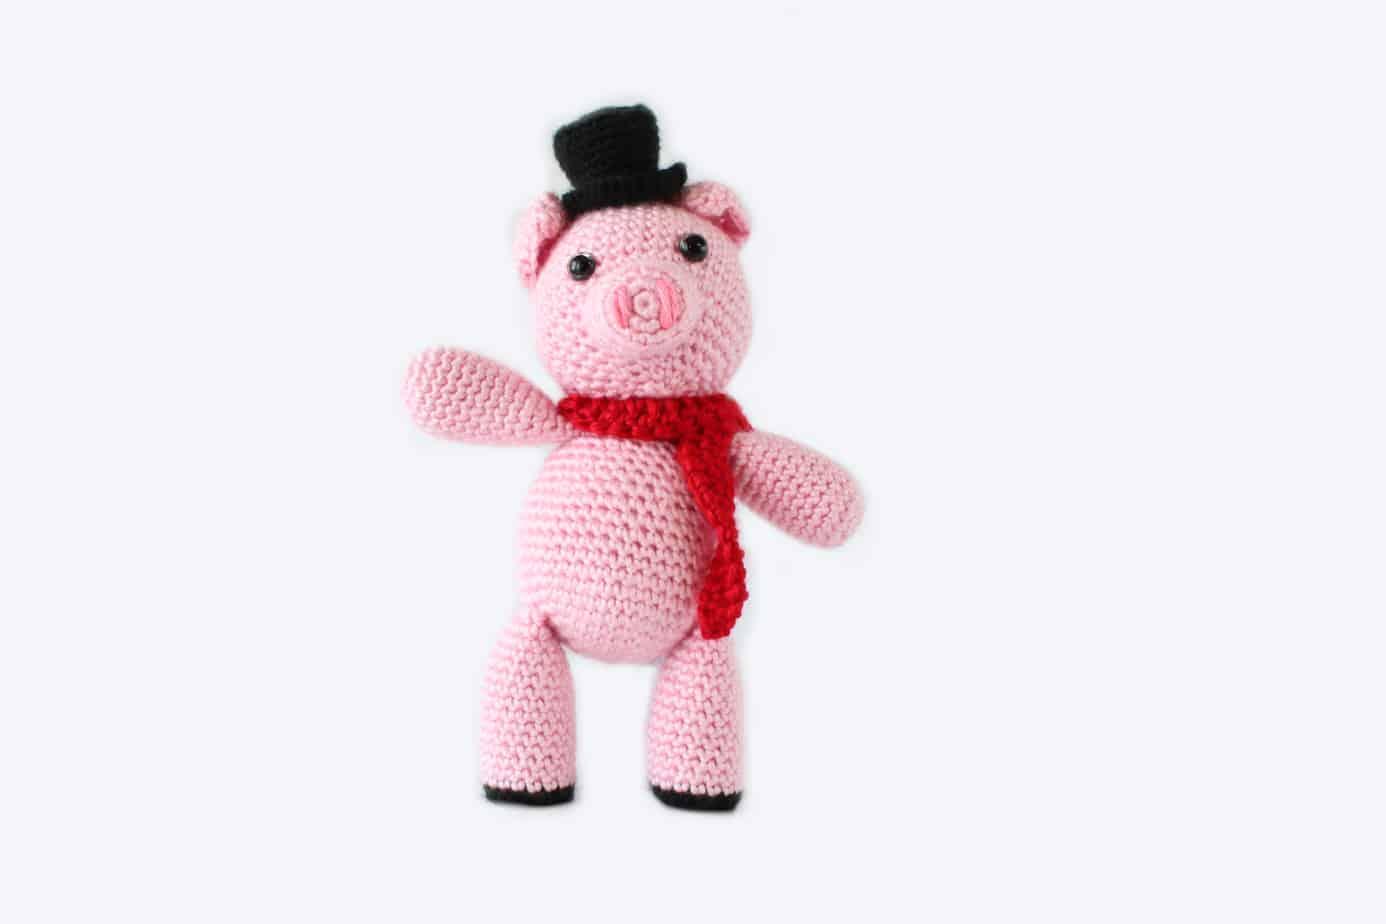 Amigurumi Piglet - FREE Crochet Pattern / Tutorial in ENGLISH ...   924x1386